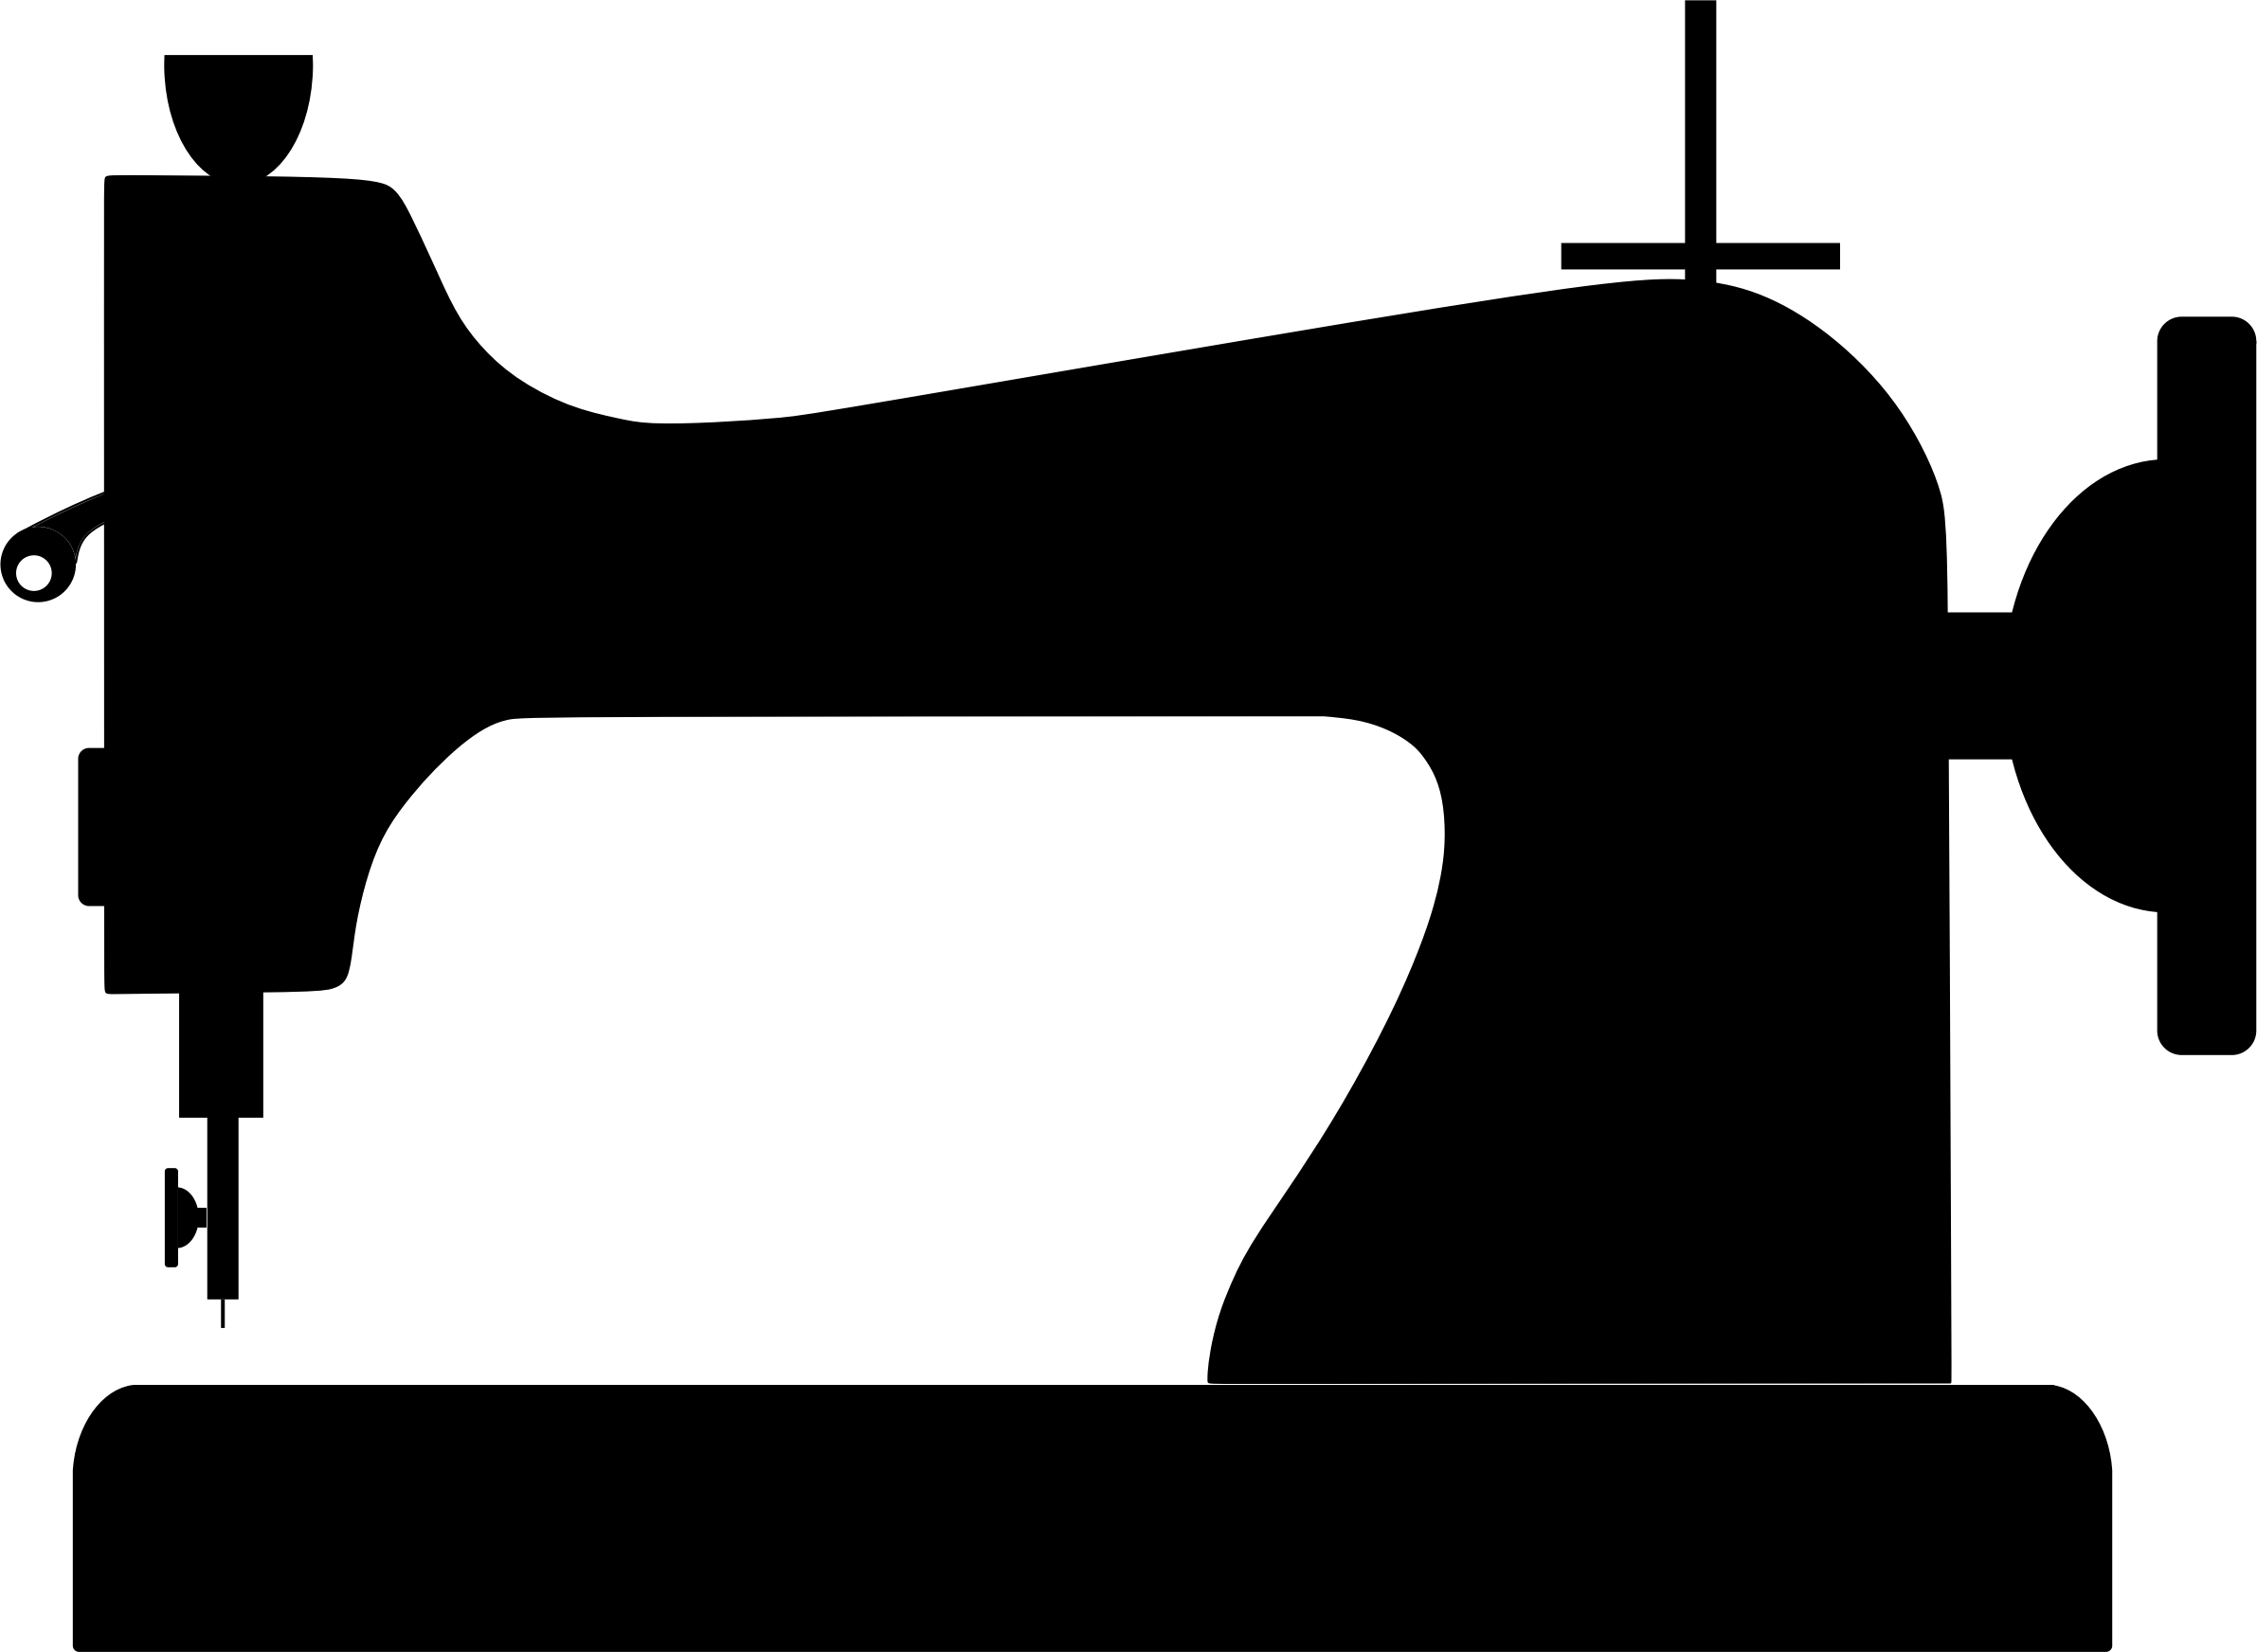 2382x1744 Clipart